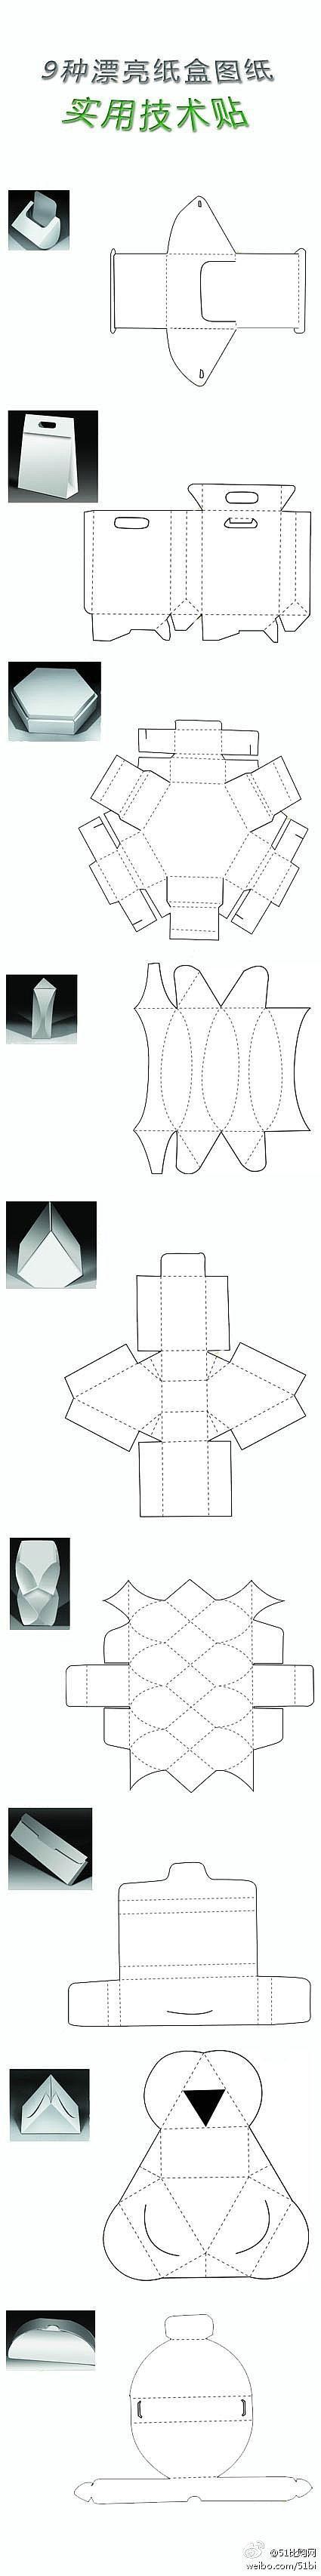 pomysły na pudełka